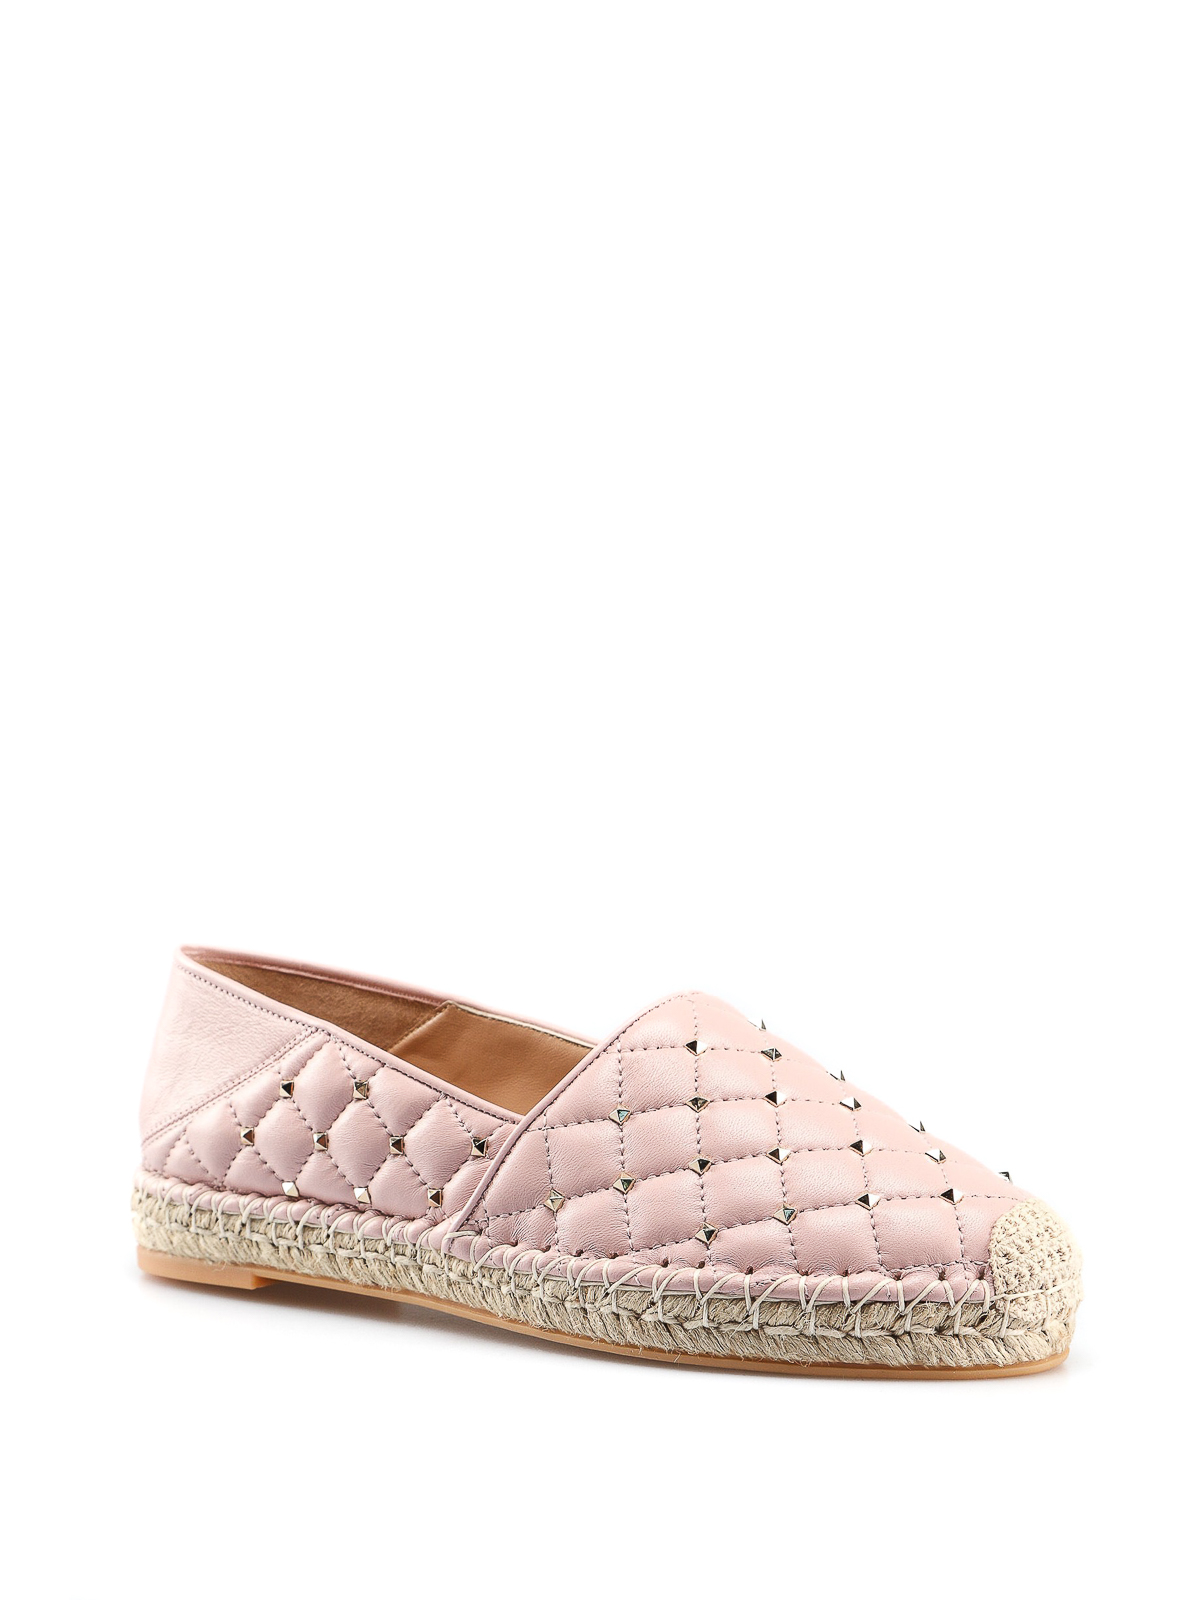 93640c04f VALENTINO GARAVANI: espadrilles online - Rockstud light pink leather  espadrilles